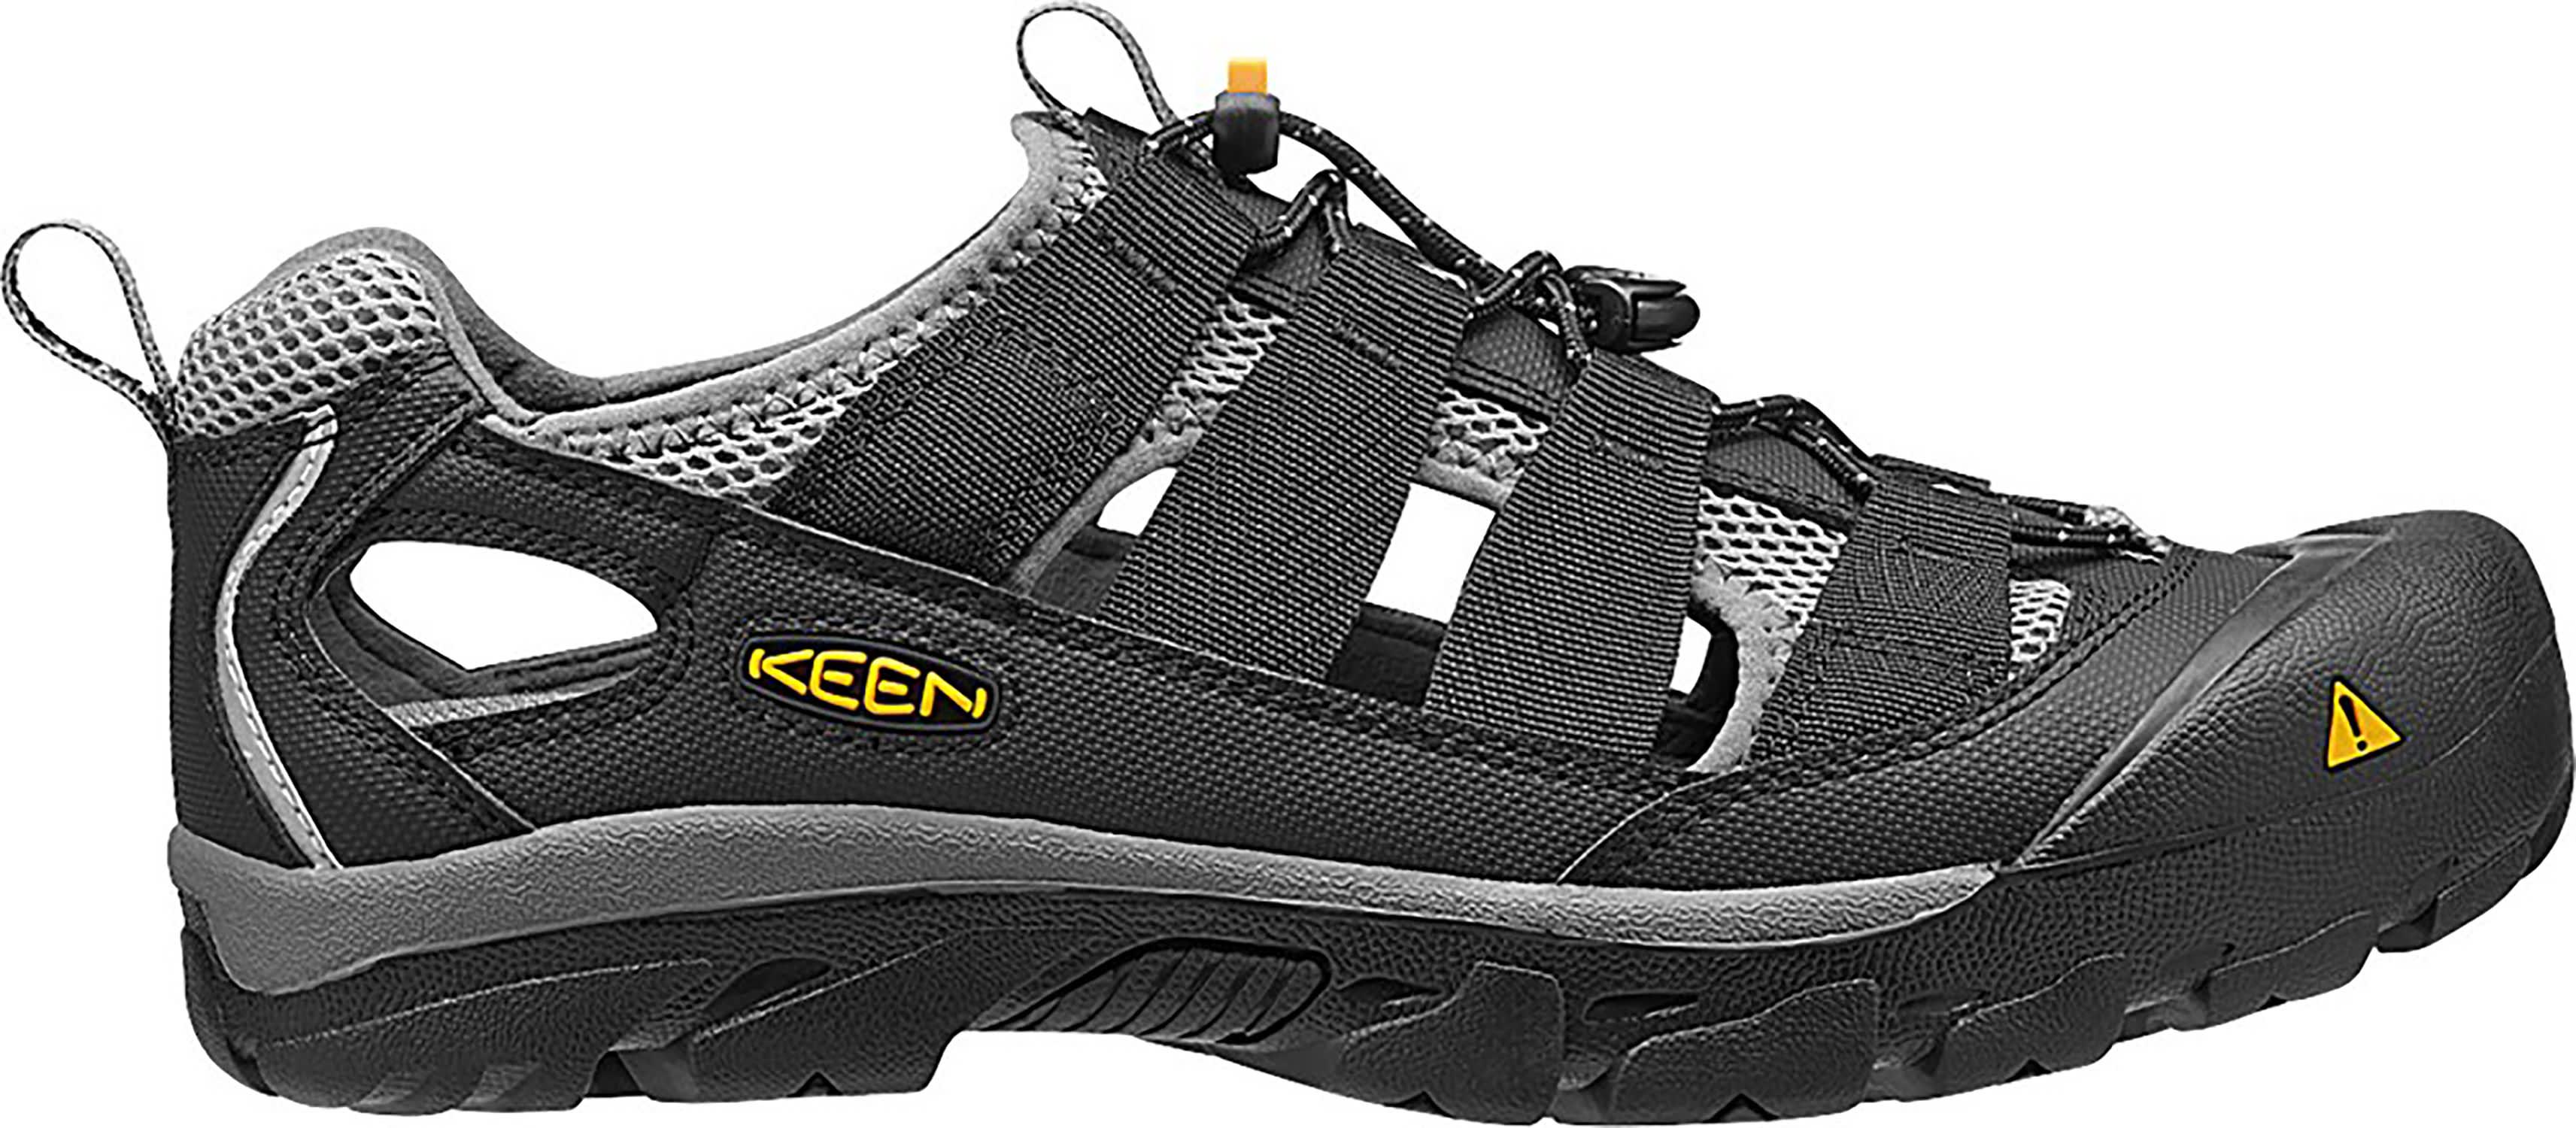 4c06bcbe2ed4 Keen Commuter 4 Bike Shoes - thumbnail 1